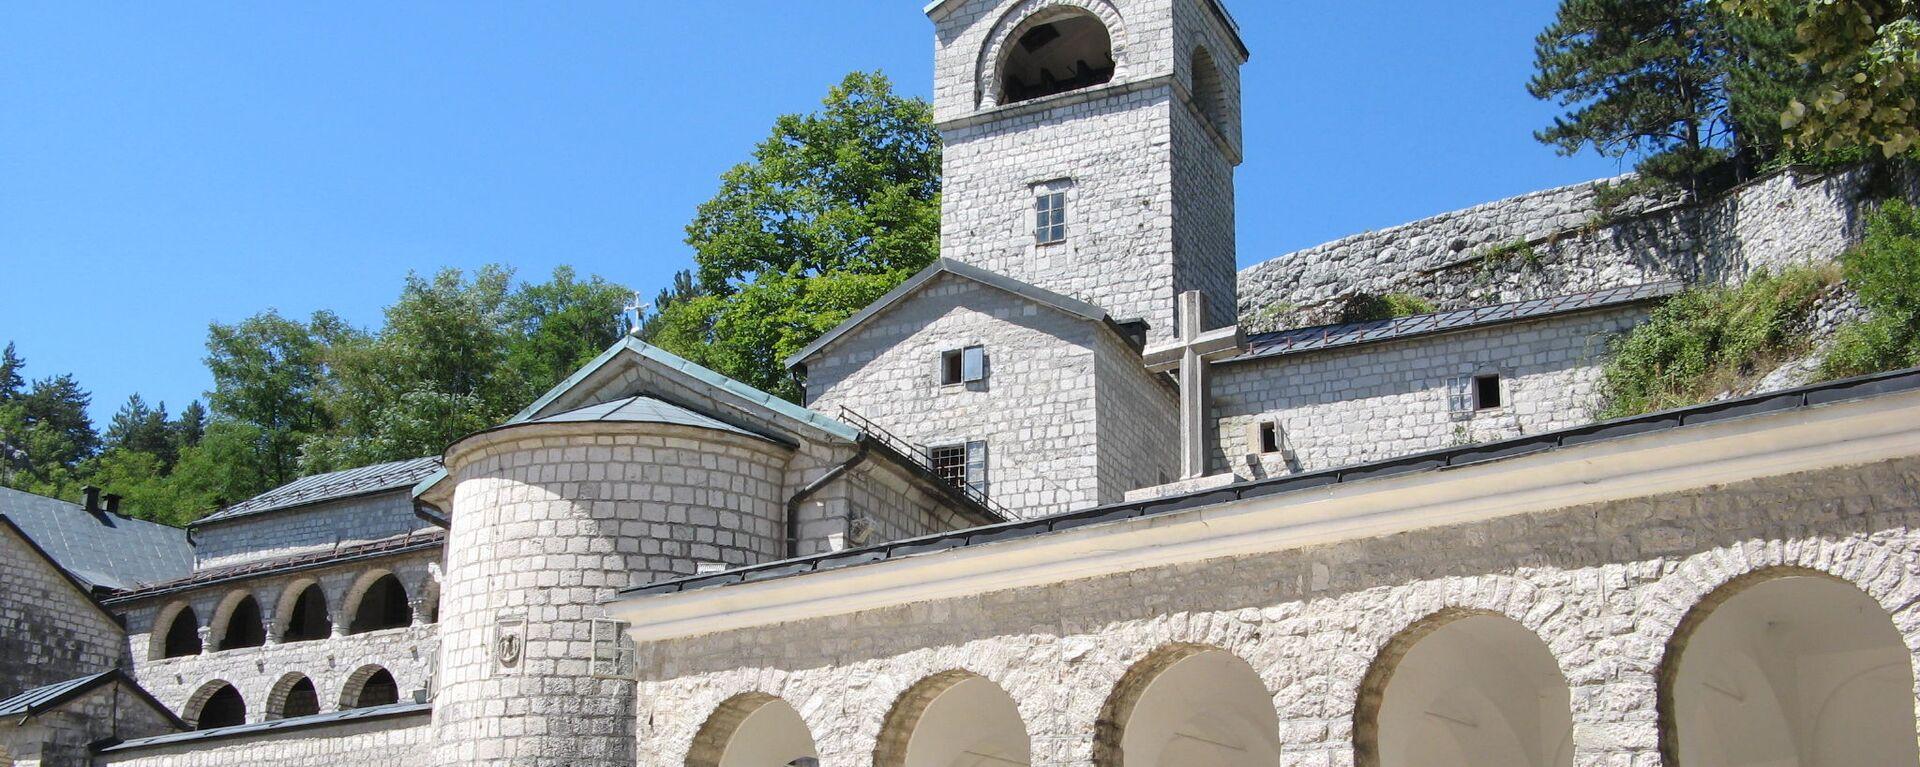 Цетињски манастир - Sputnik Србија, 1920, 14.09.2021